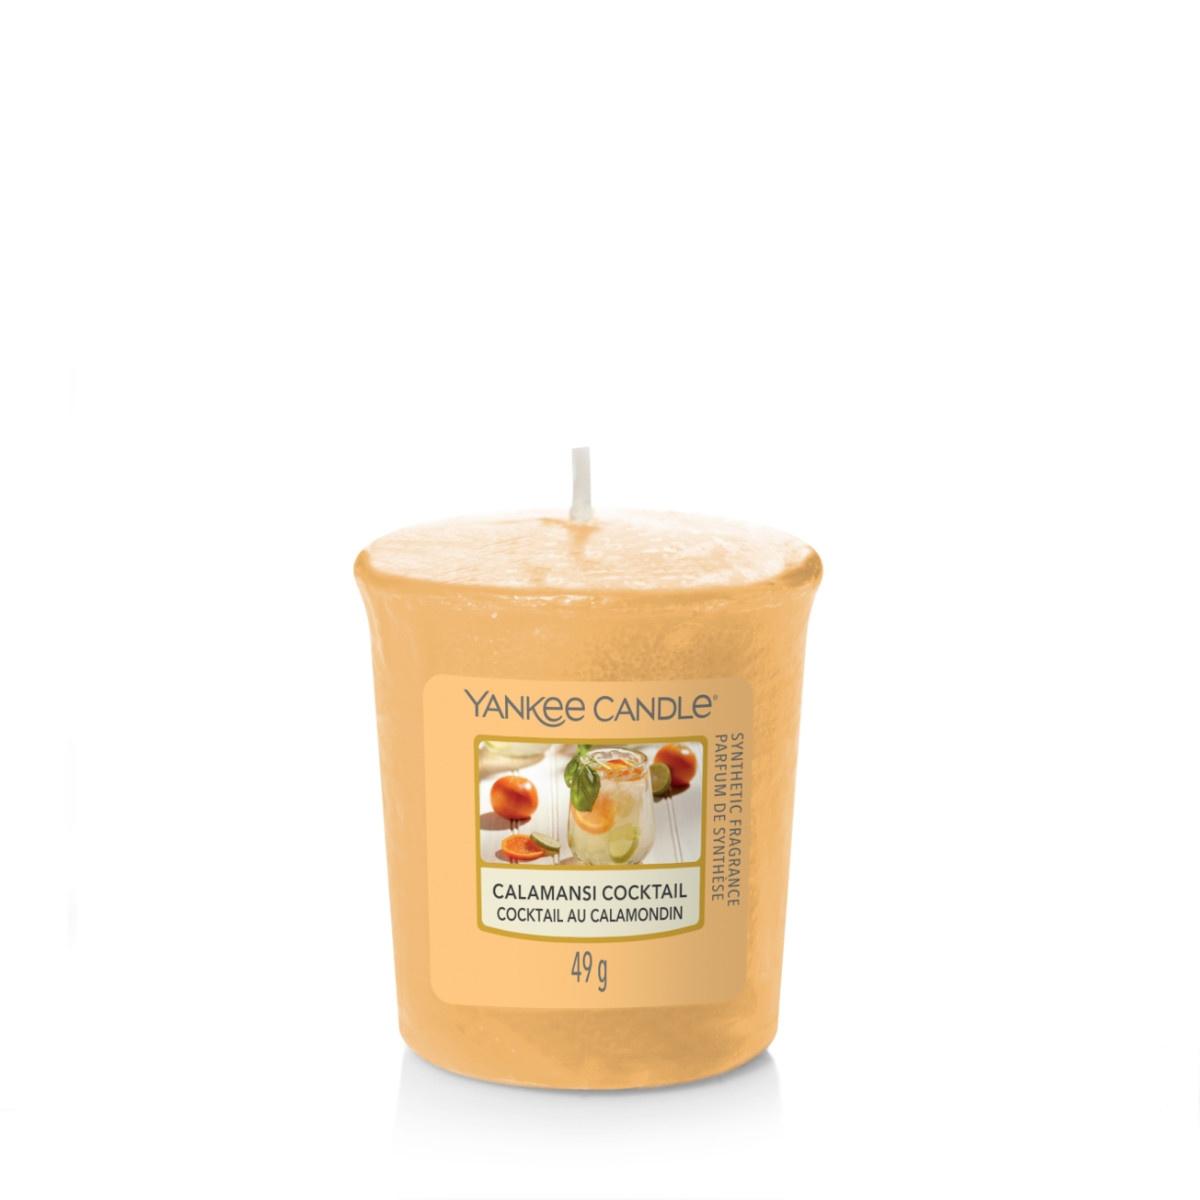 Yankee Candle Calamansi Cocktail - Votive